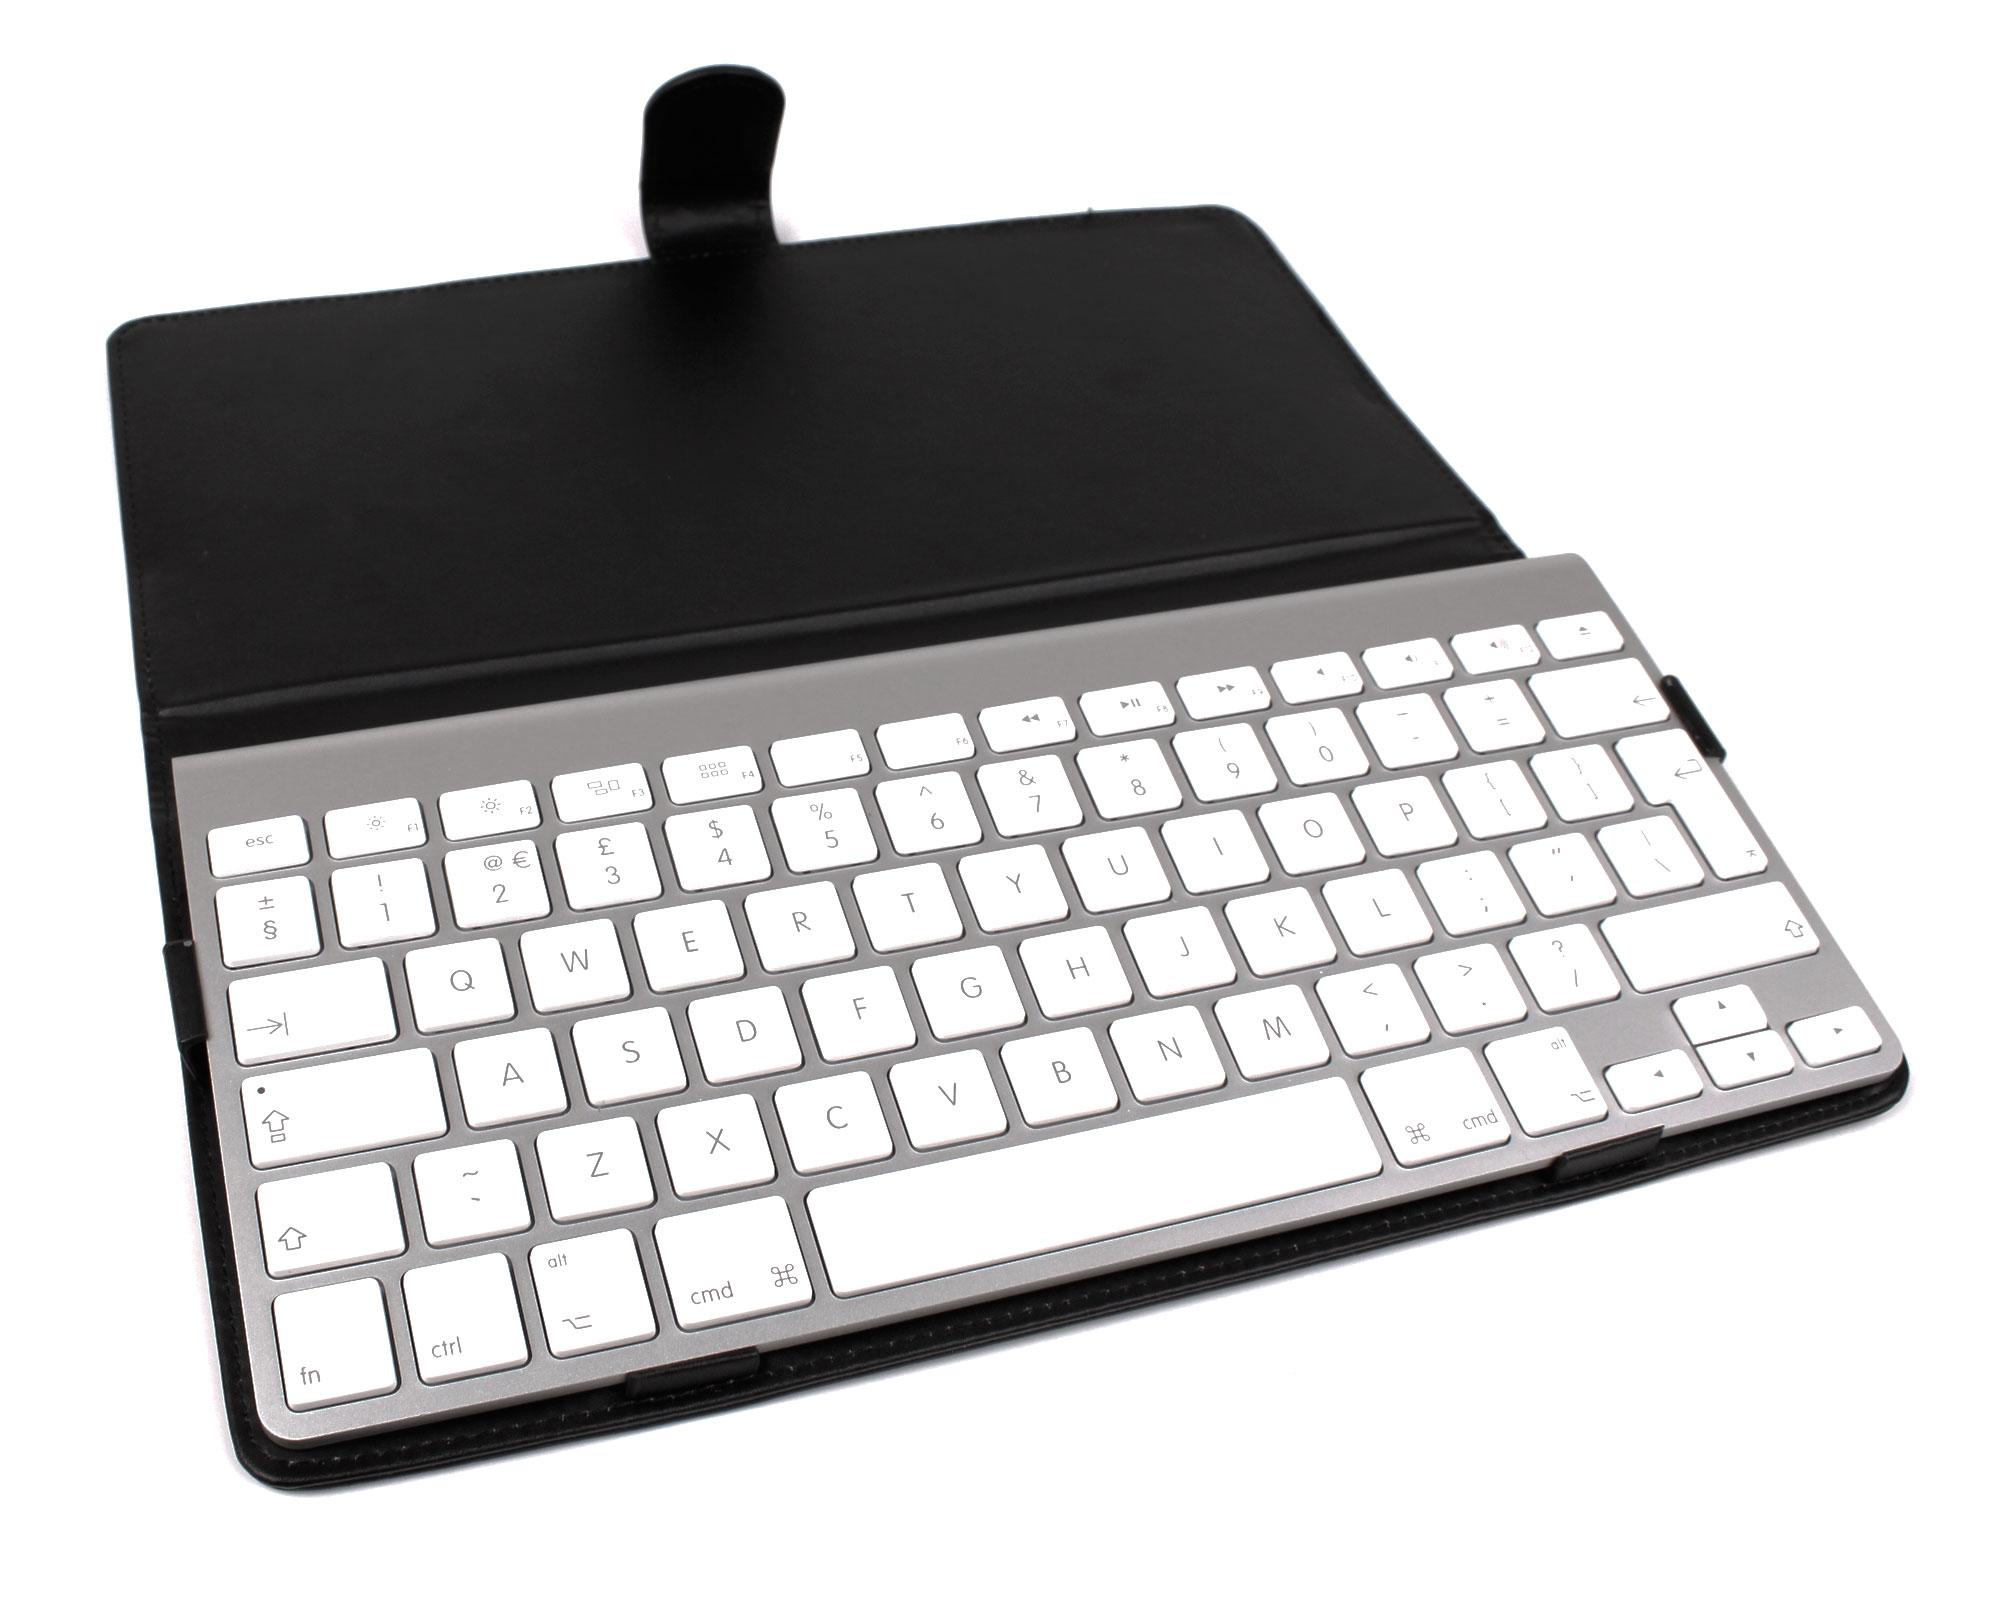 black pu leather protective case for apple mac wireless keyboard model a1314 ebay. Black Bedroom Furniture Sets. Home Design Ideas